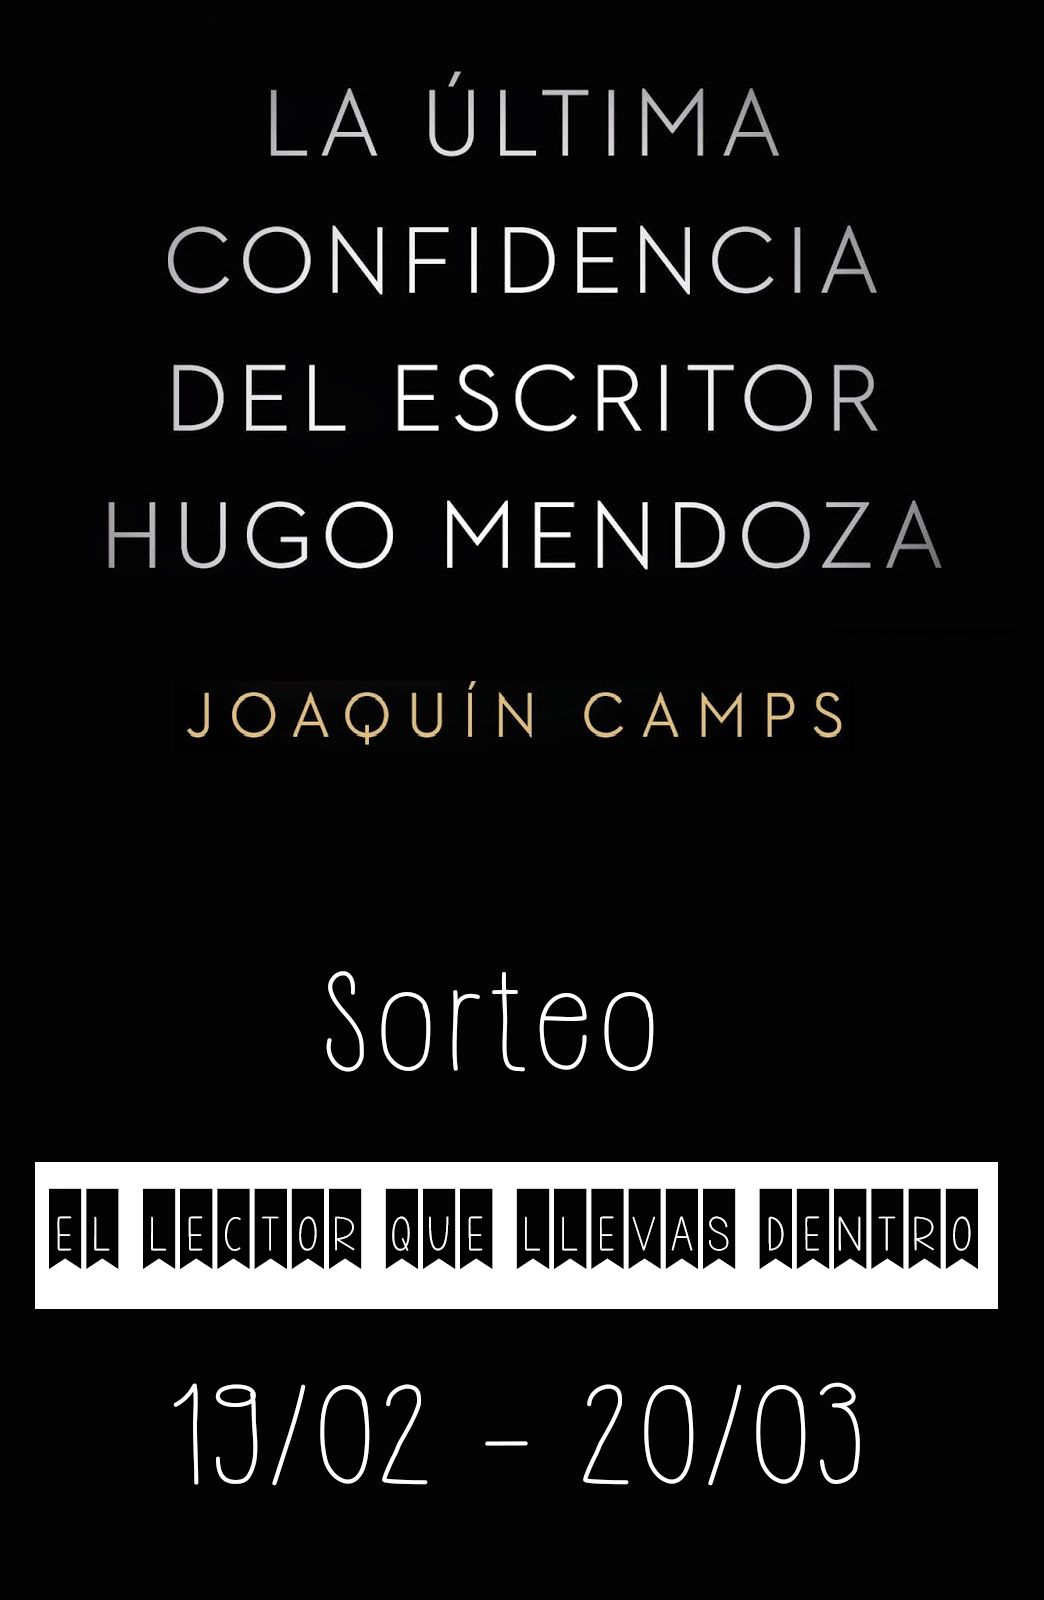 http://www.ellectorquellevasdentro.com/2015/02/sorteo-ultima-confidencia-escritor-hugo-mendoza.html?showComment=1424381114954#c4731692137692489857